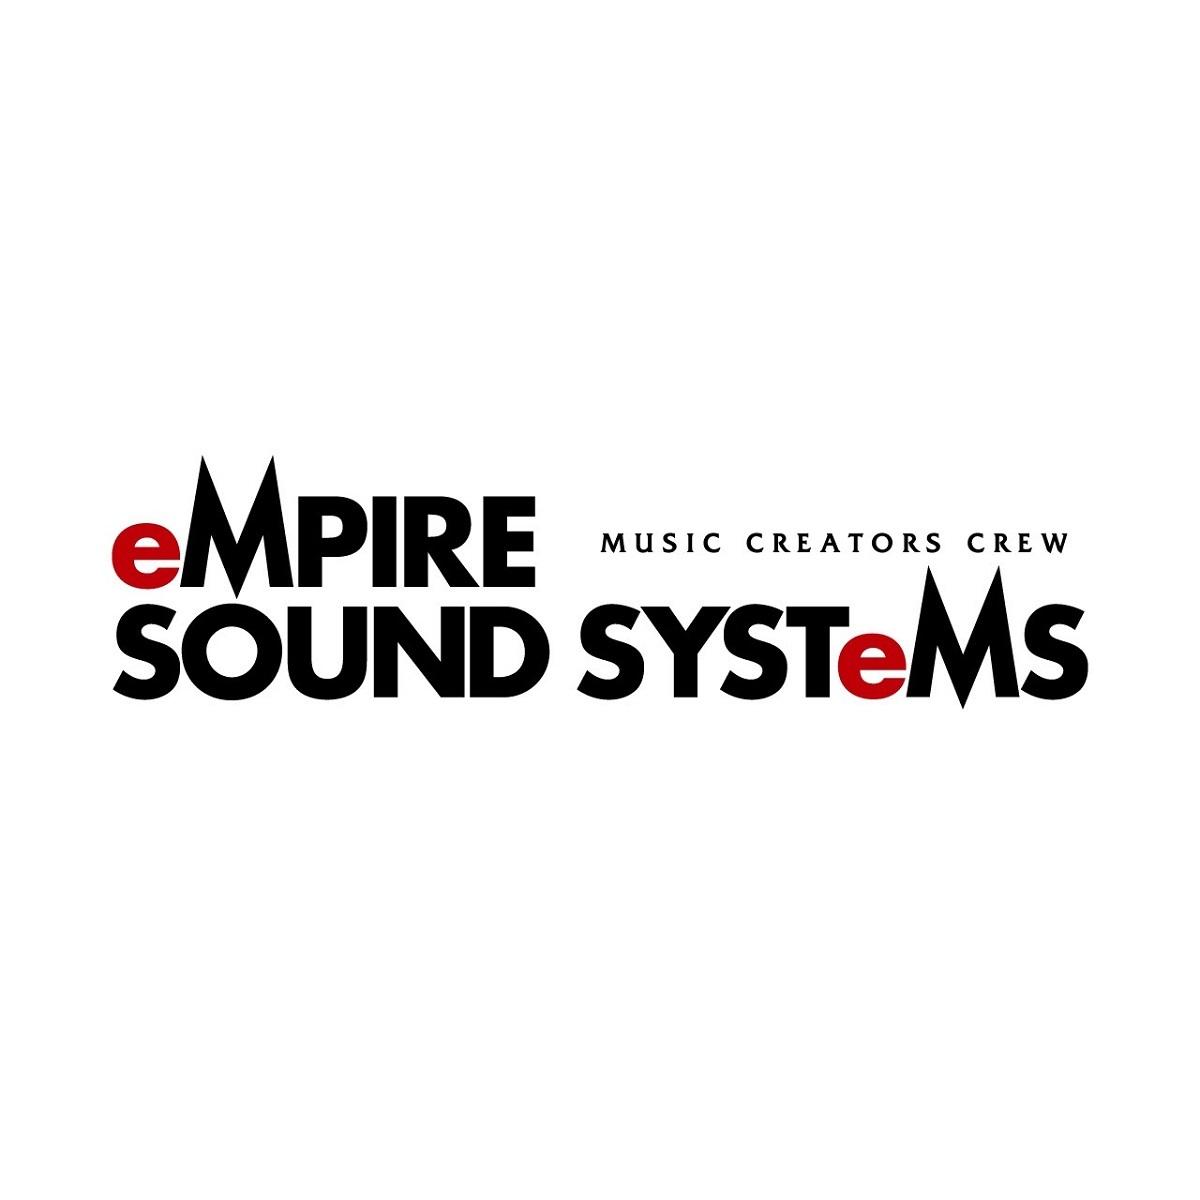 eMPIRE SOUND SYSTeMS